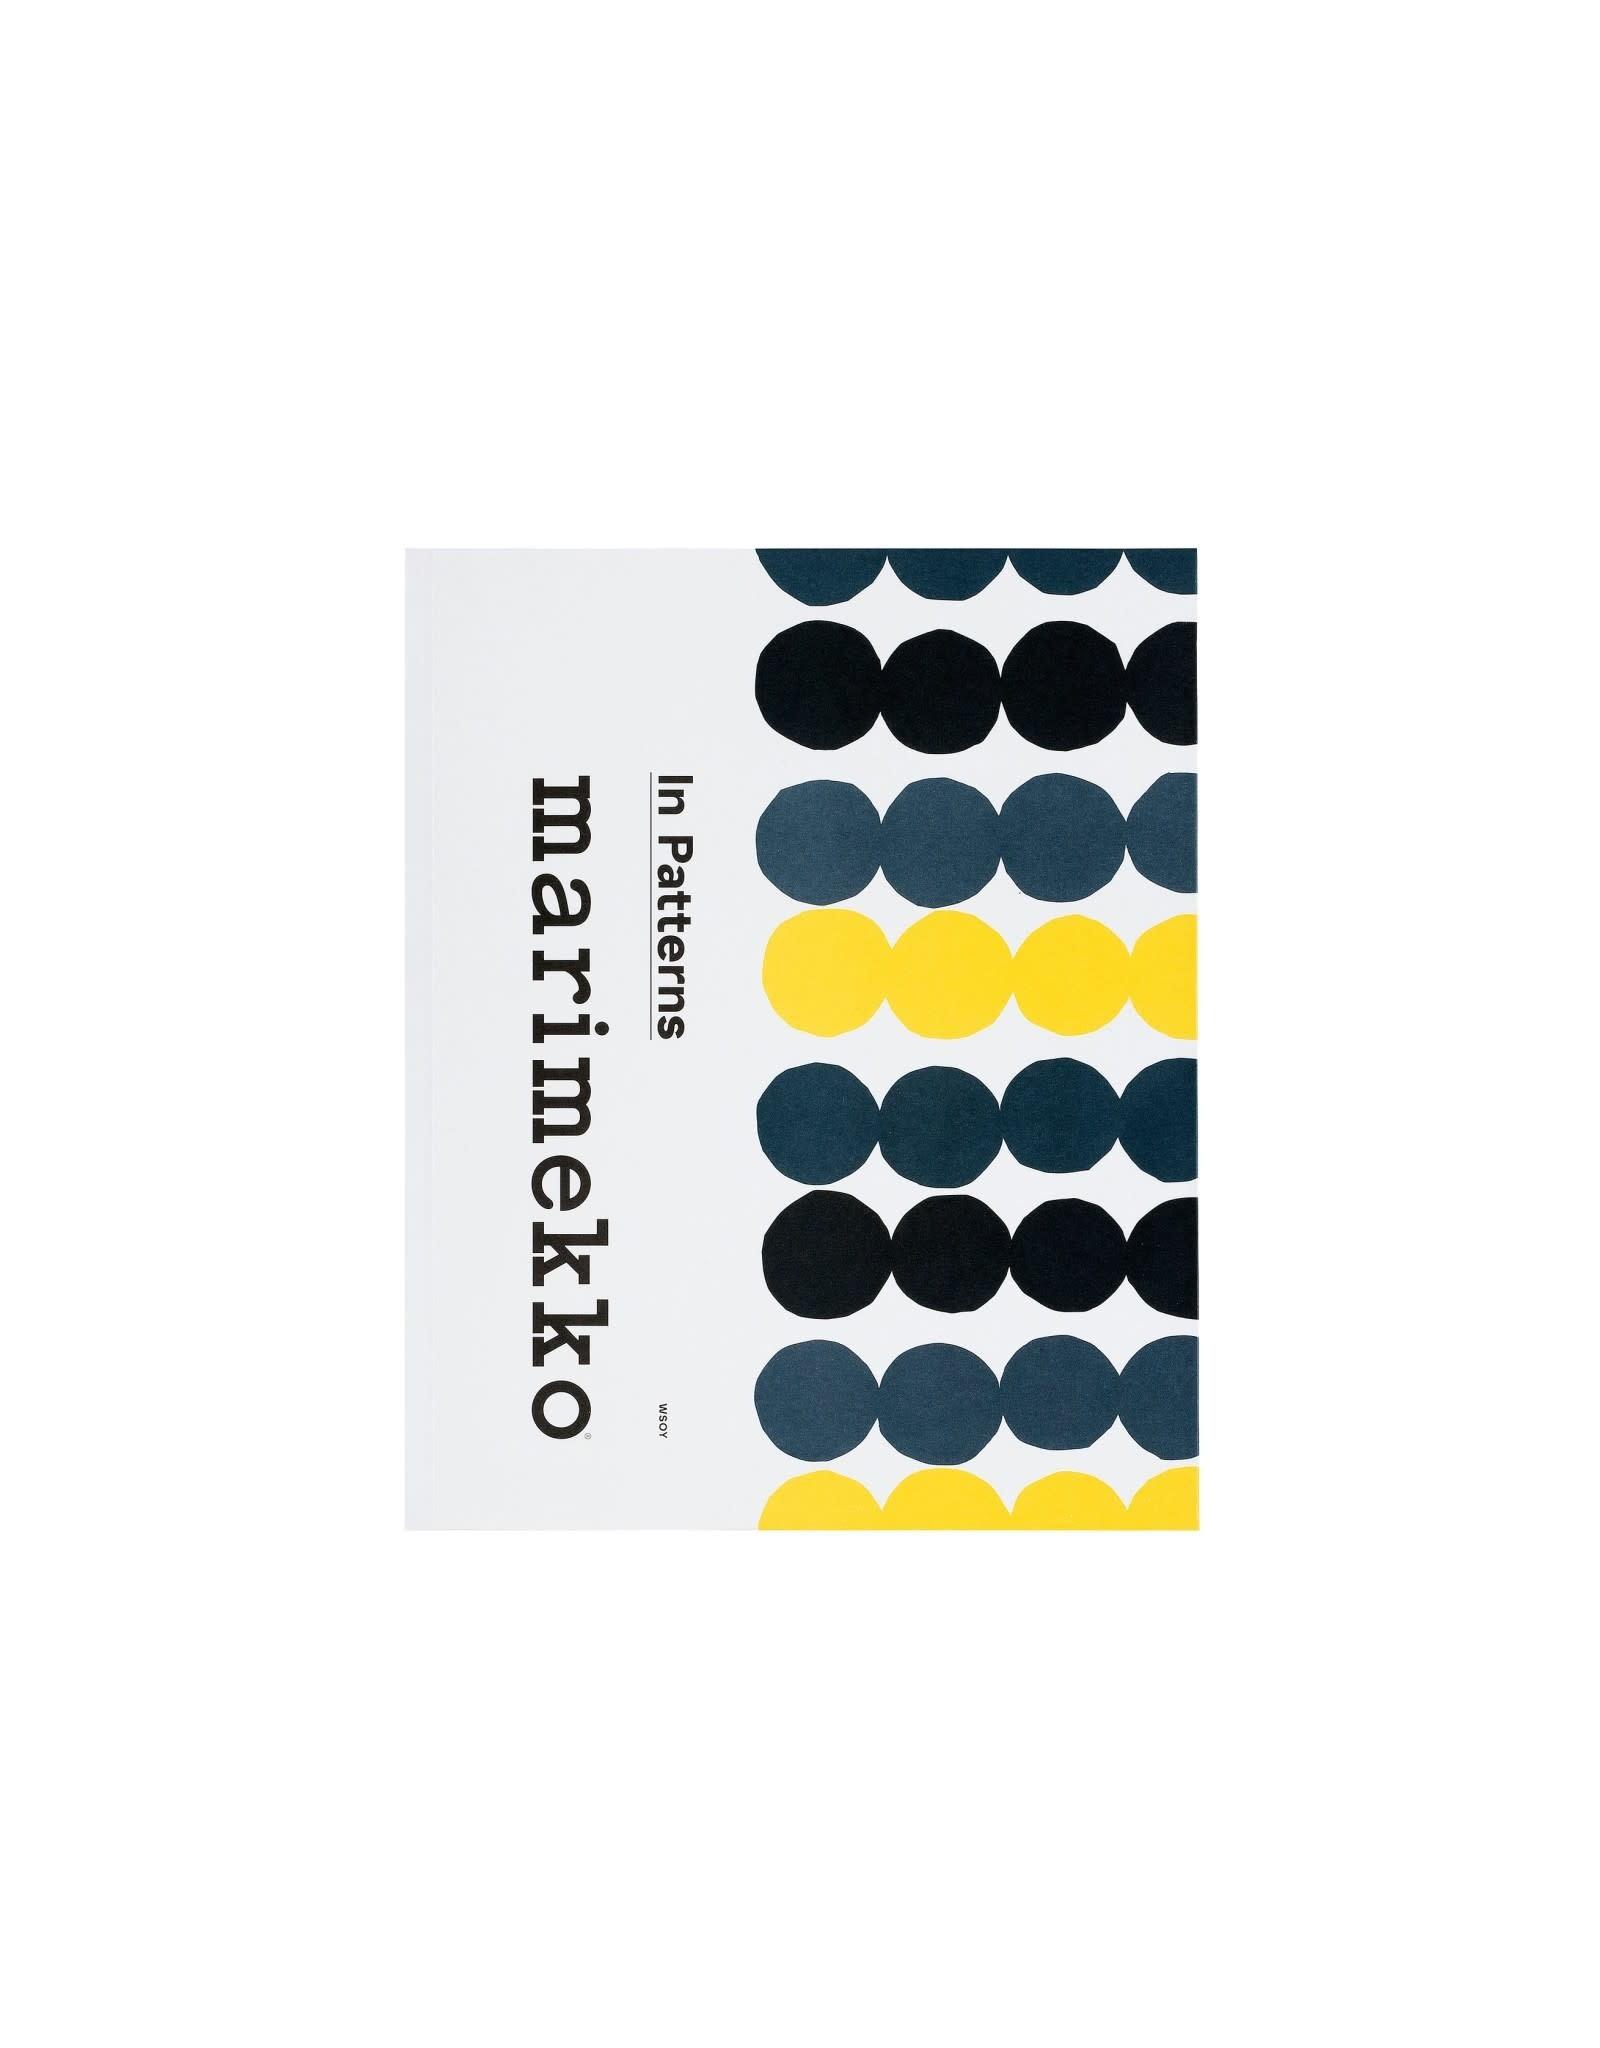 Marimekko: In Patterns